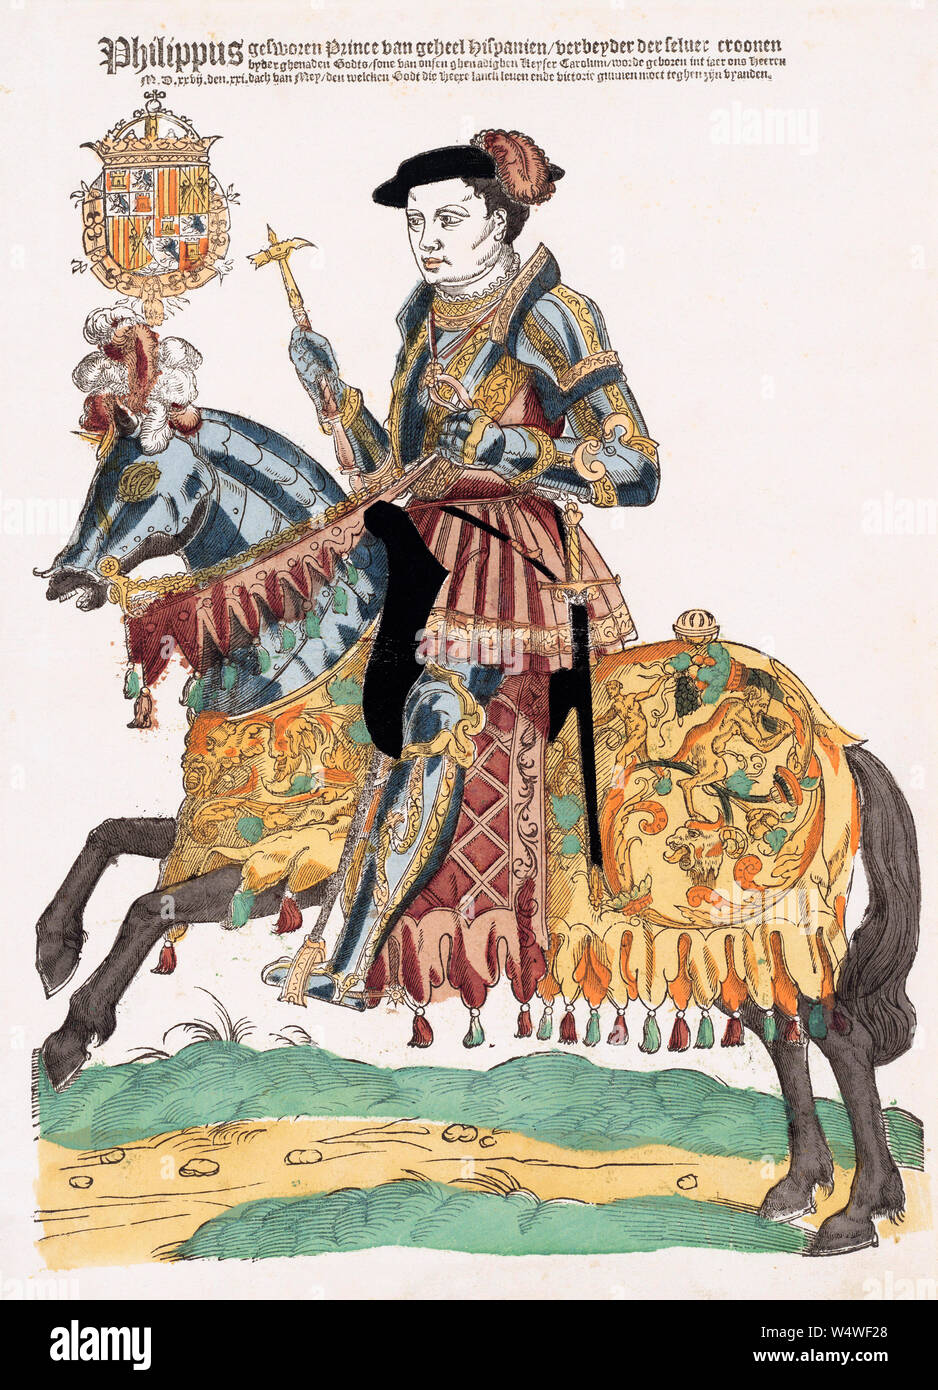 Portrait of King Philip II of Spain on horseback.  King Philip II, Rey Felipe II, 1527 - 1598.  After a 16th century print. Stock Photo